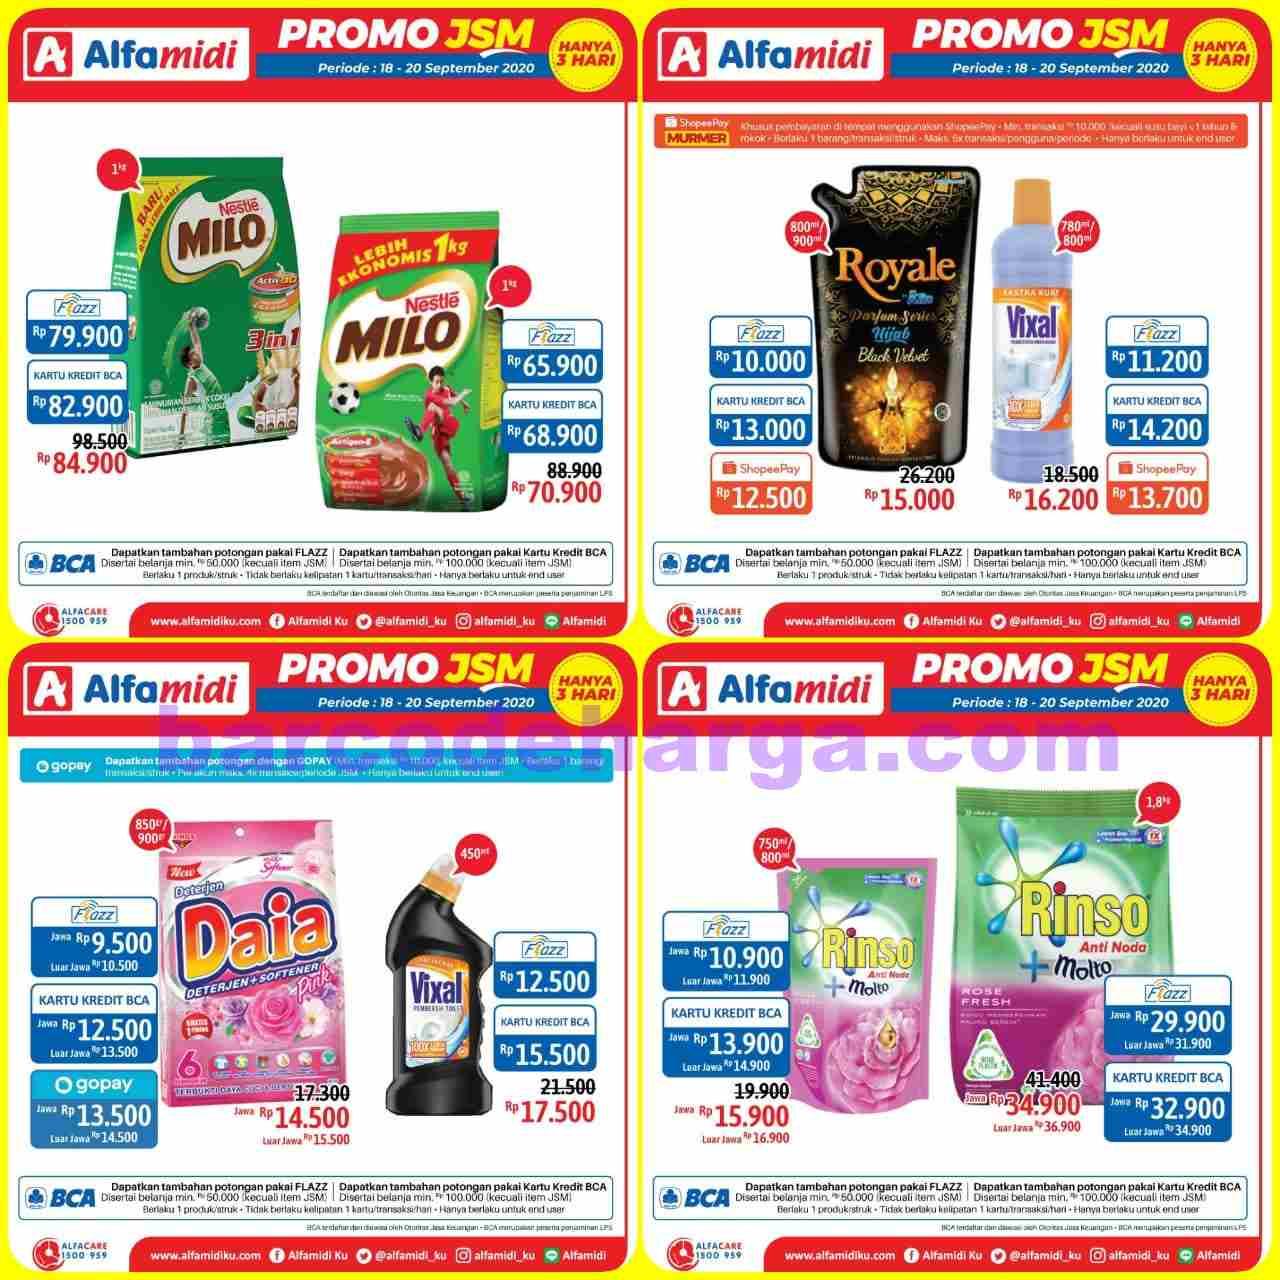 Katalog Promo JSM Alfamidi Akhir Pekan 18 - 20 September